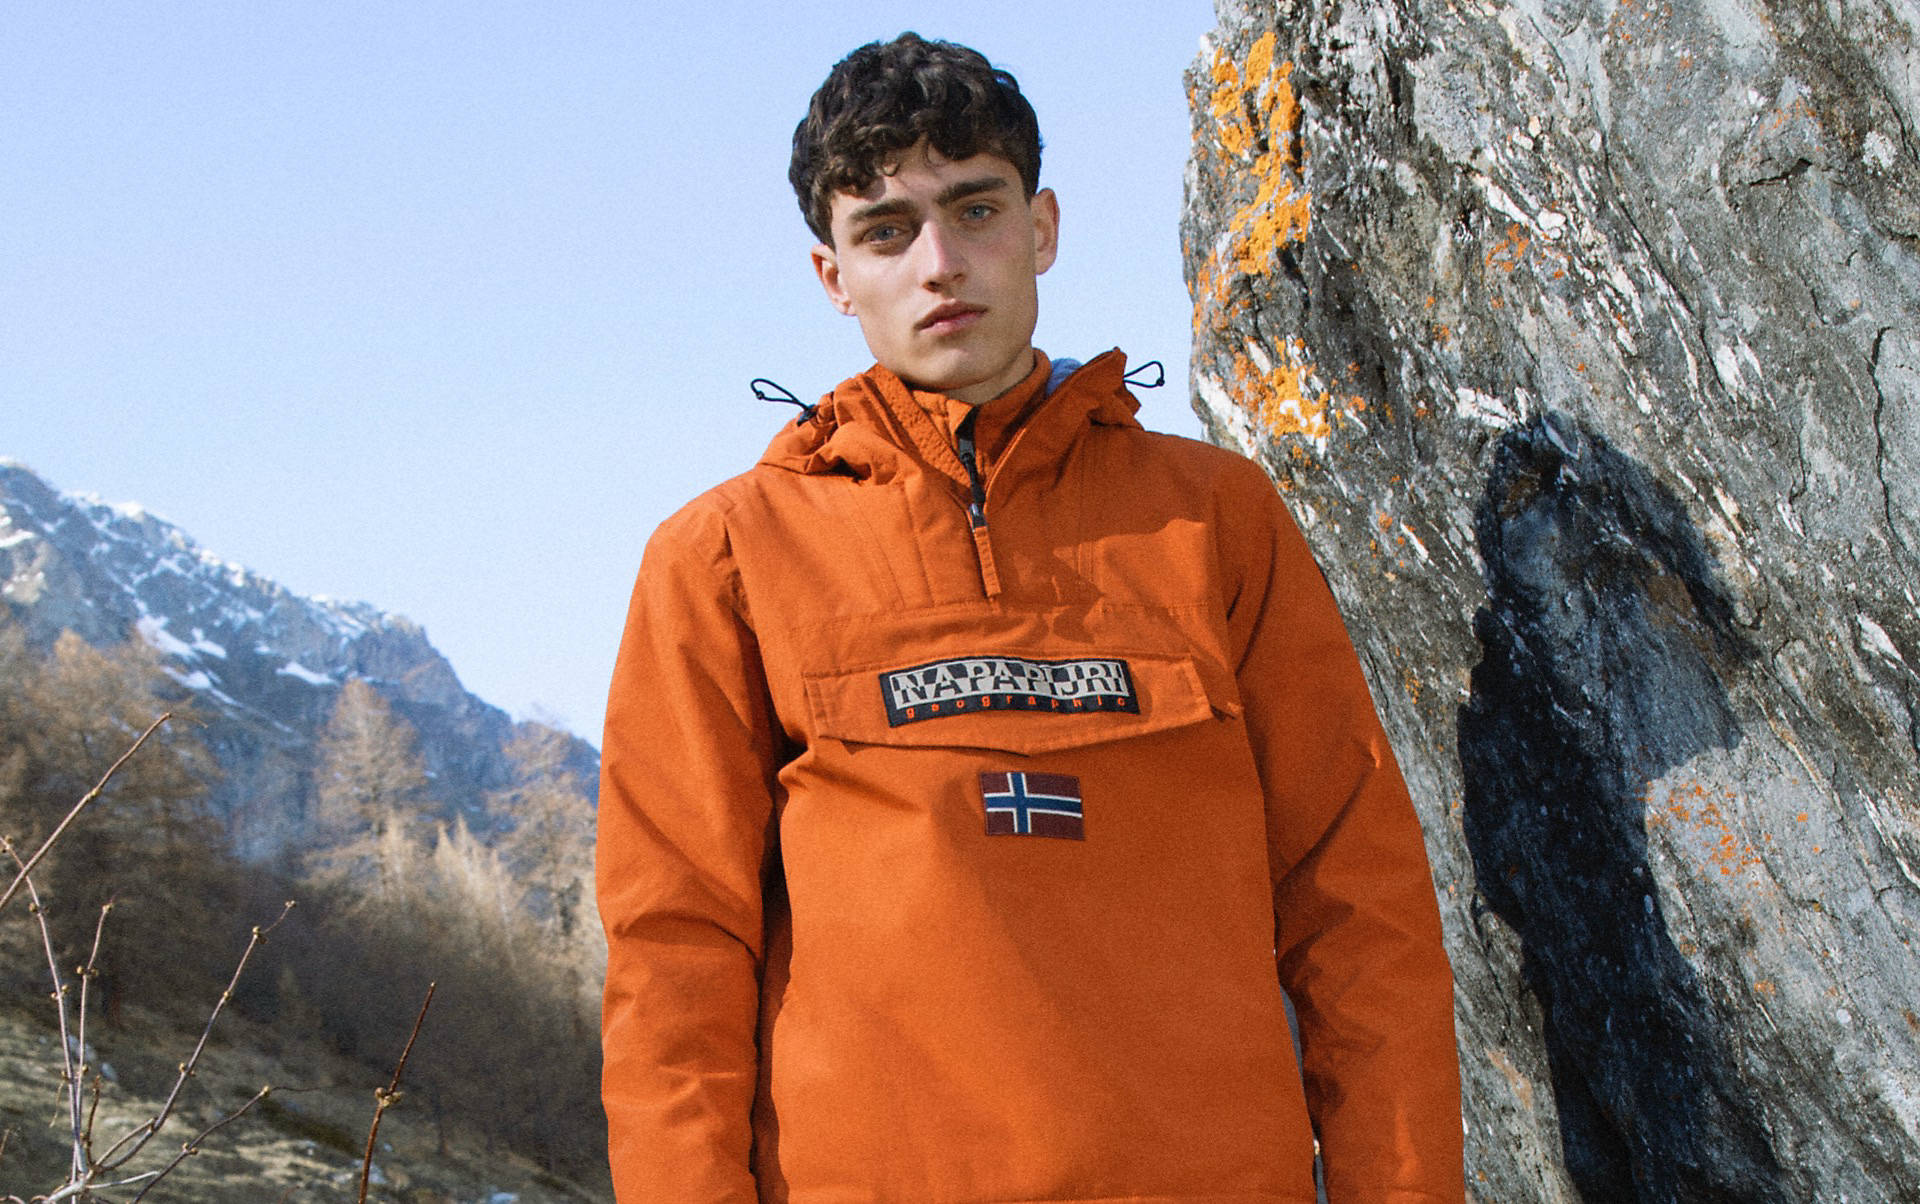 The Rainforest Jacket